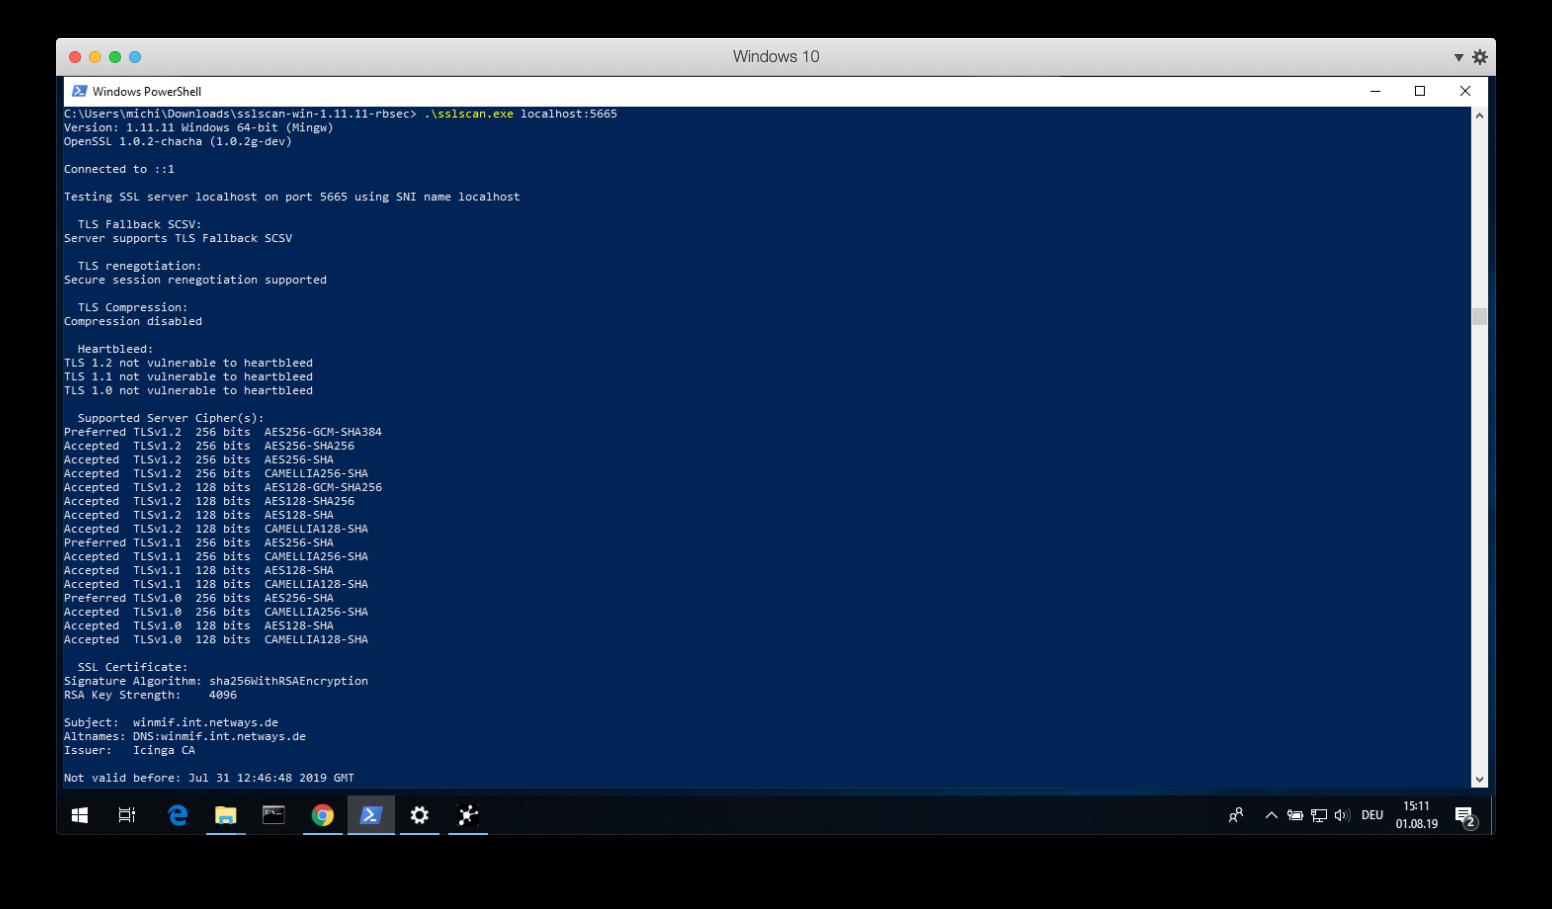 windows_icinga_2 10 4_ciphers_sslscan